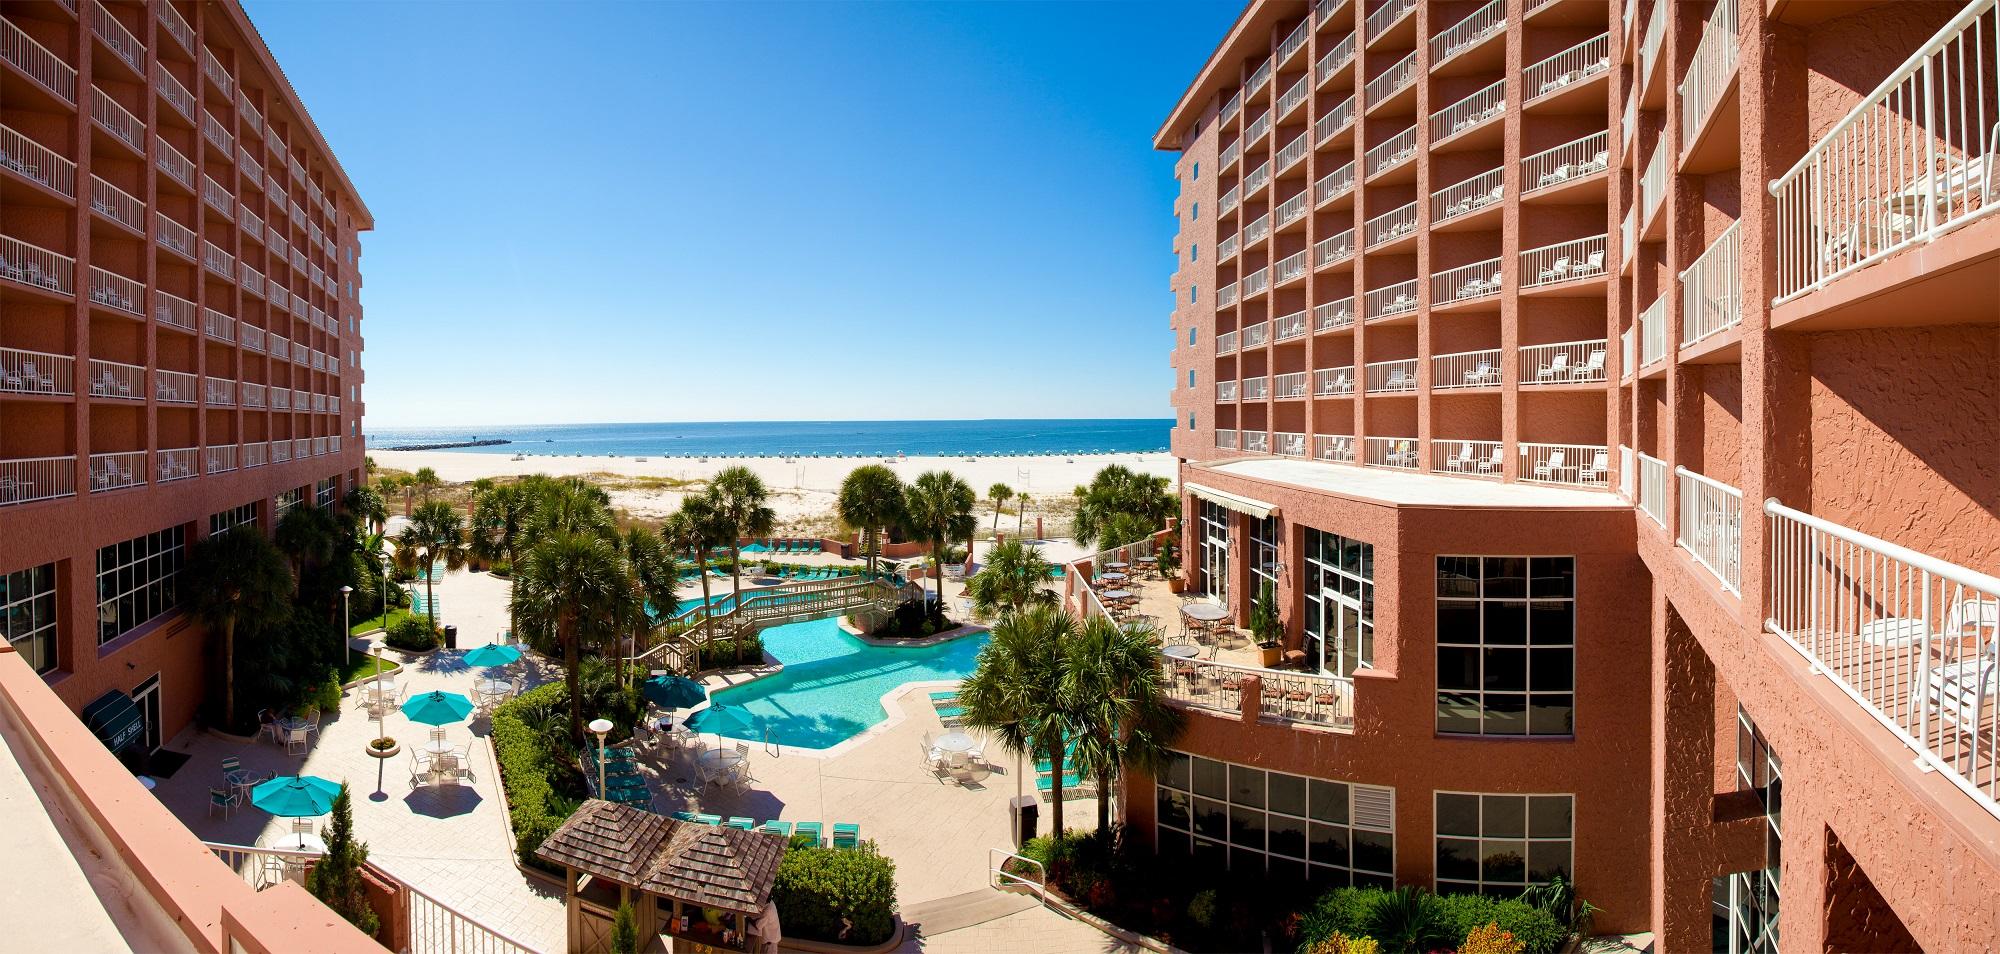 Resorts  Gulf Shores  Orange Beach